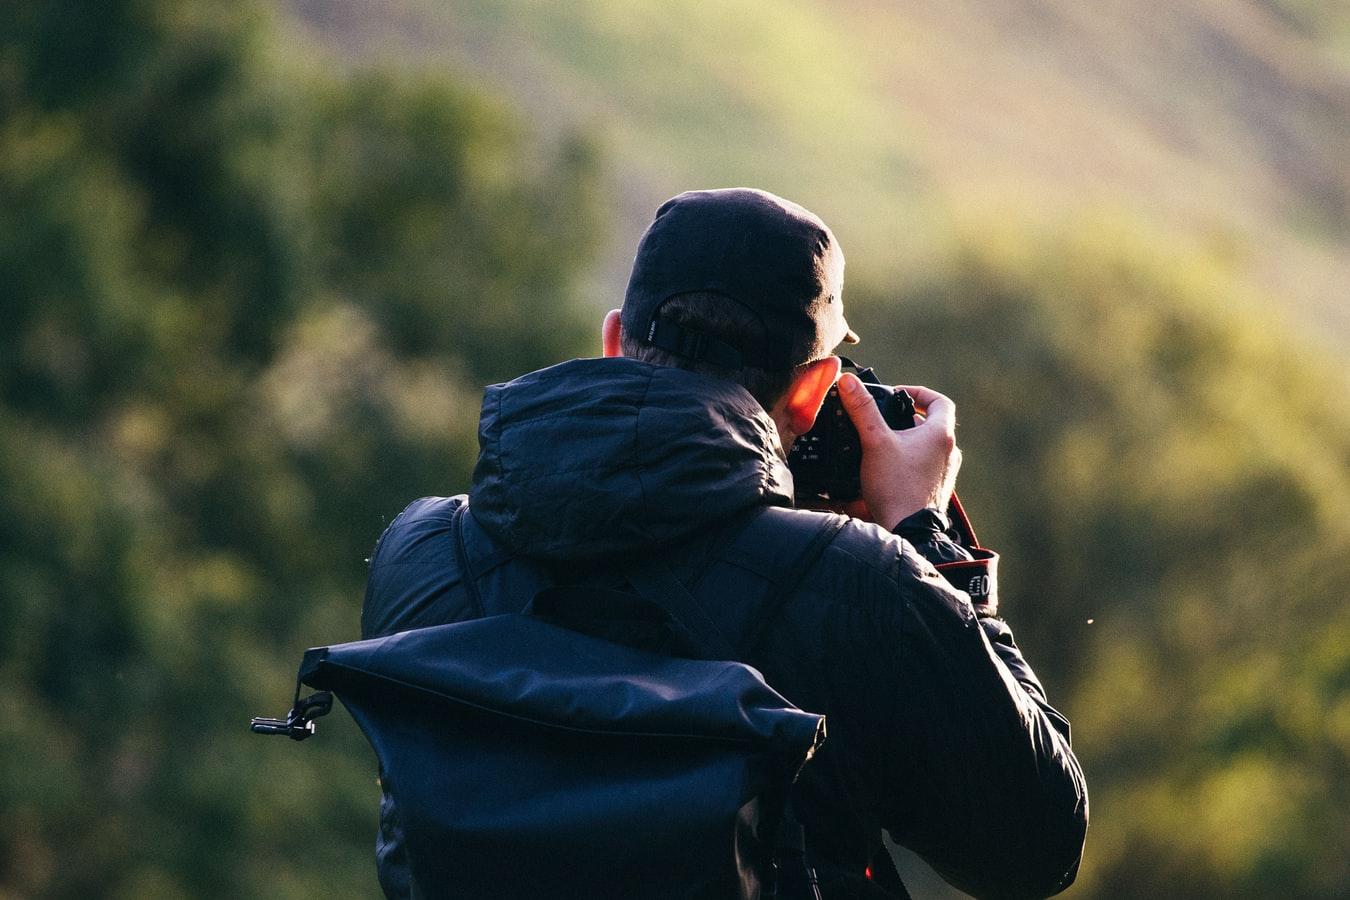 How to Take Epic Travel Photos Main